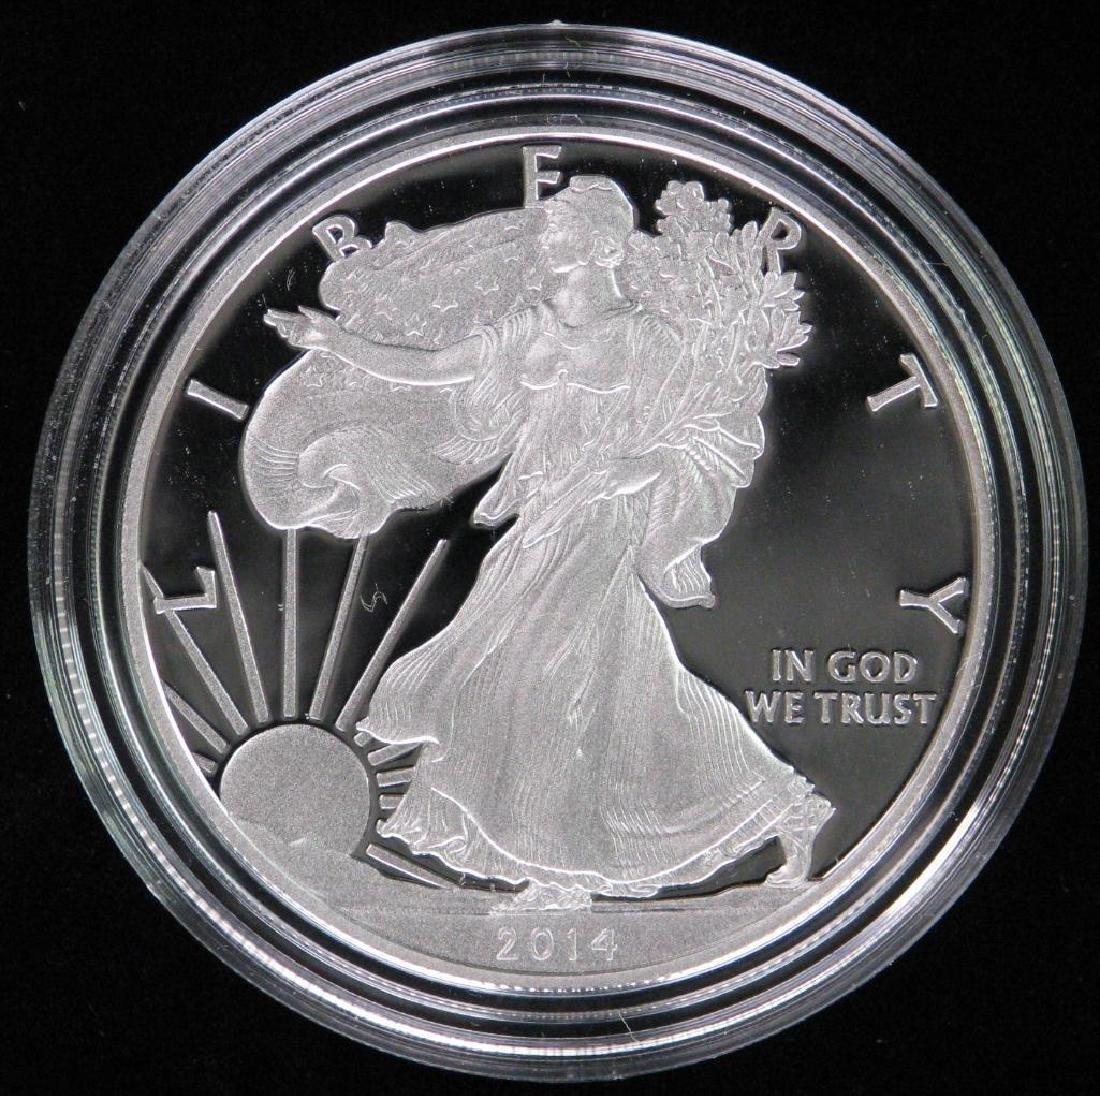 2014-W American Silver Eagle - Proof